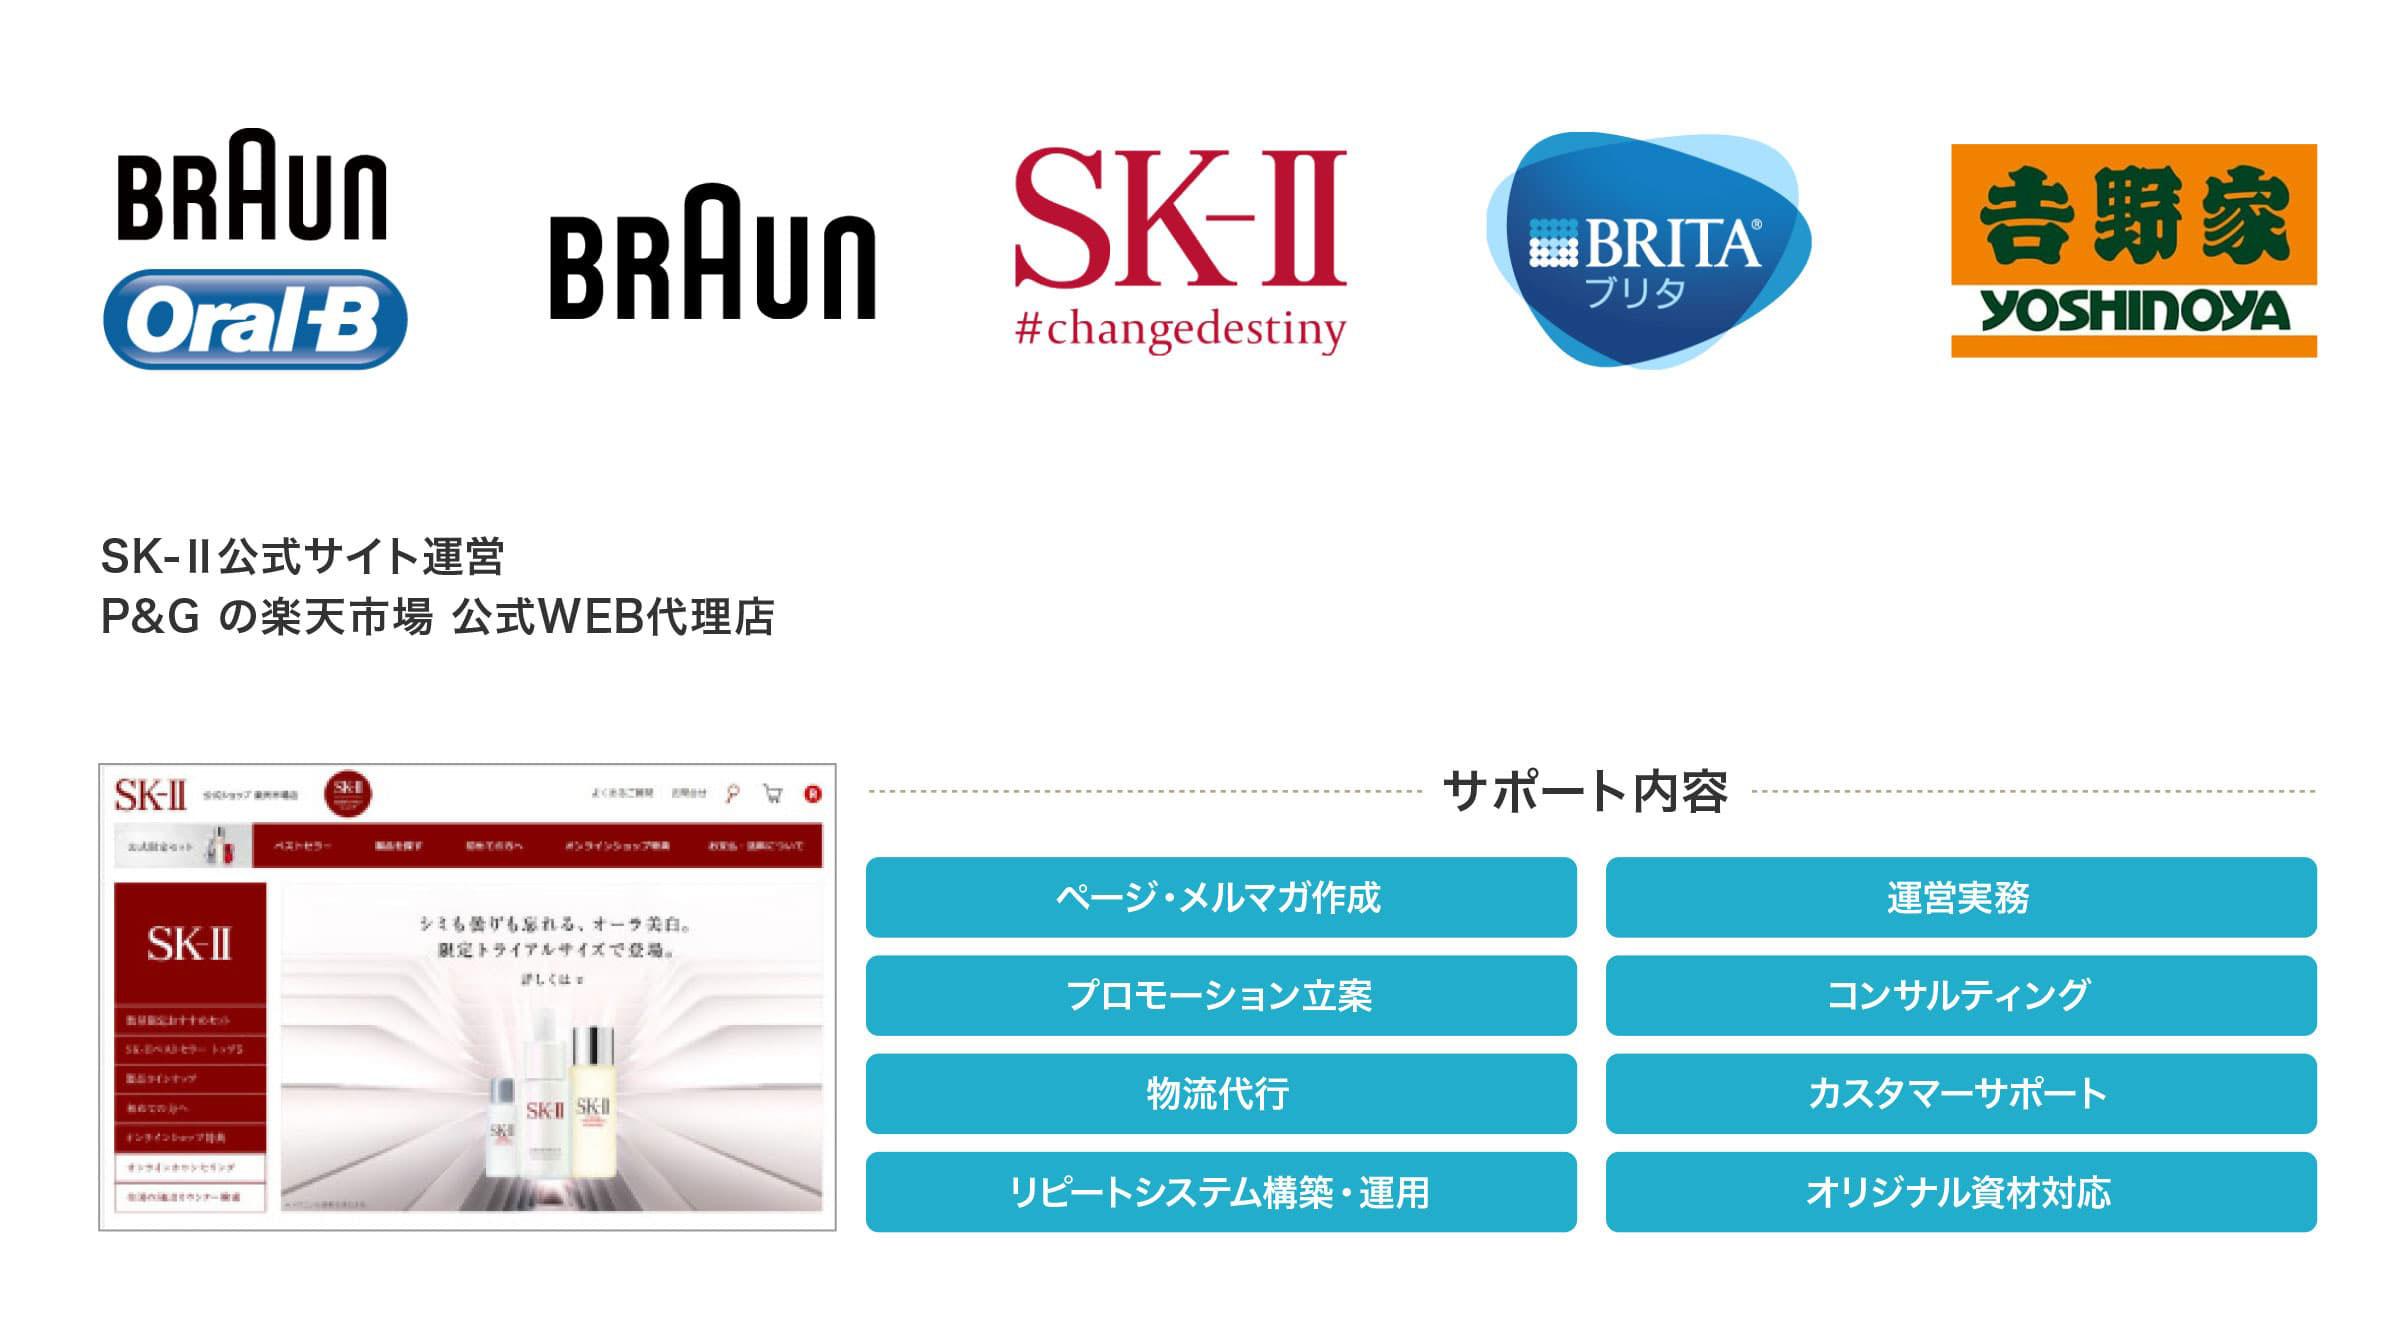 SK-Ⅱ公式サイト運営:P&G の楽天市場 公式WEB代理店